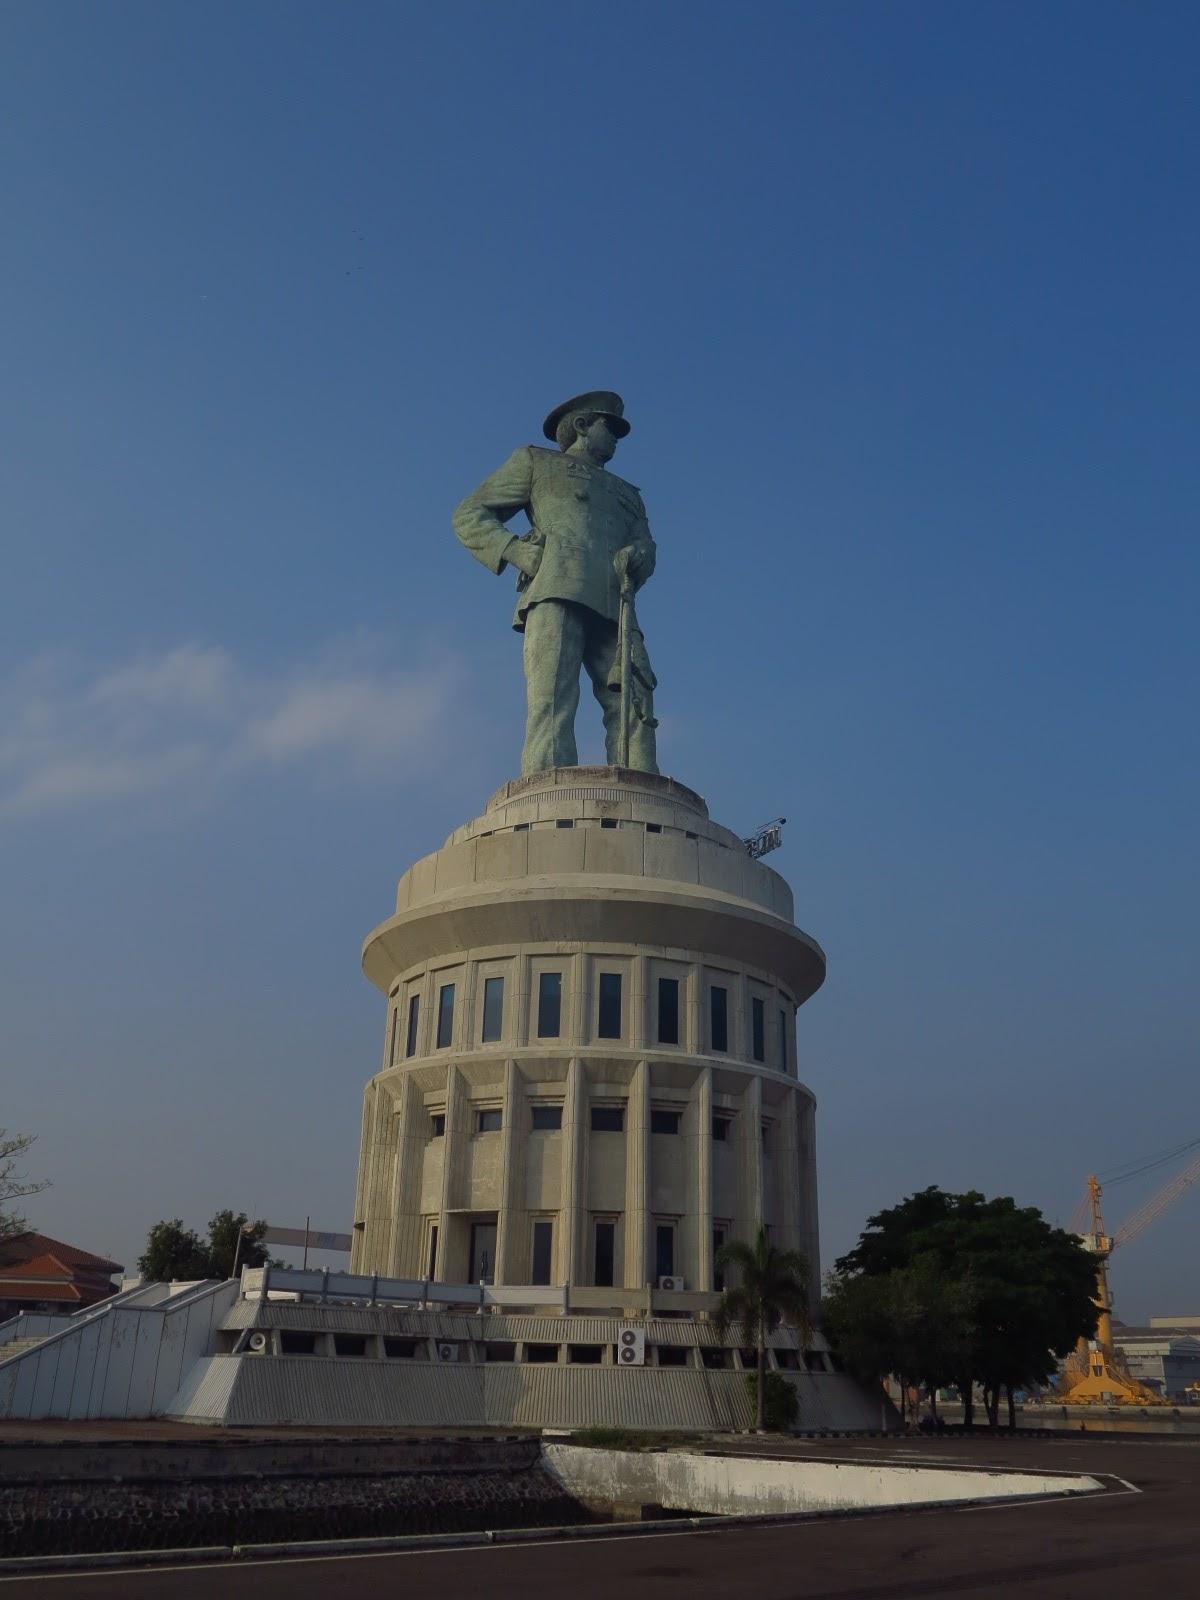 Jalan Surabaya Heritage Track Monumen Jalesveva Jayamahe Kota